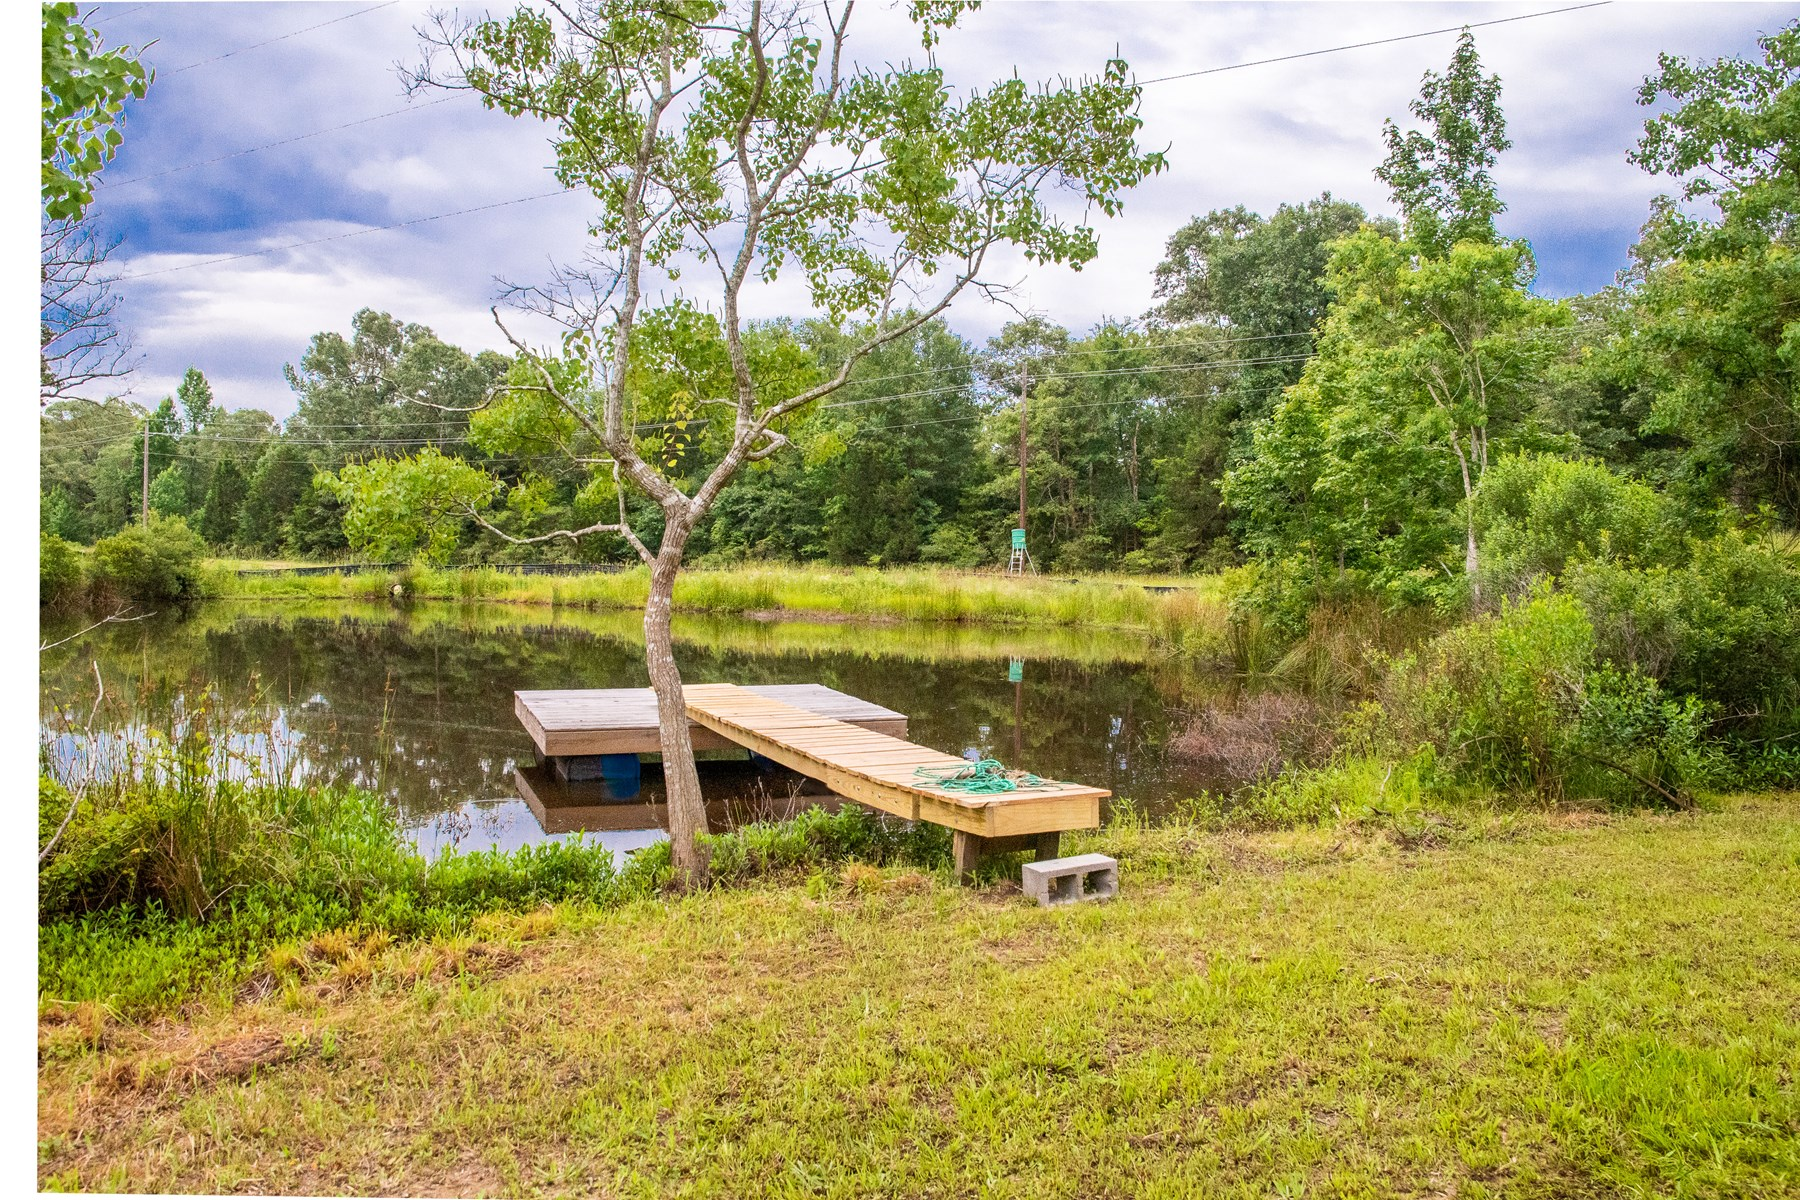 Home & 12 Acres For Sale - Buffalo, TX- Leon County TX